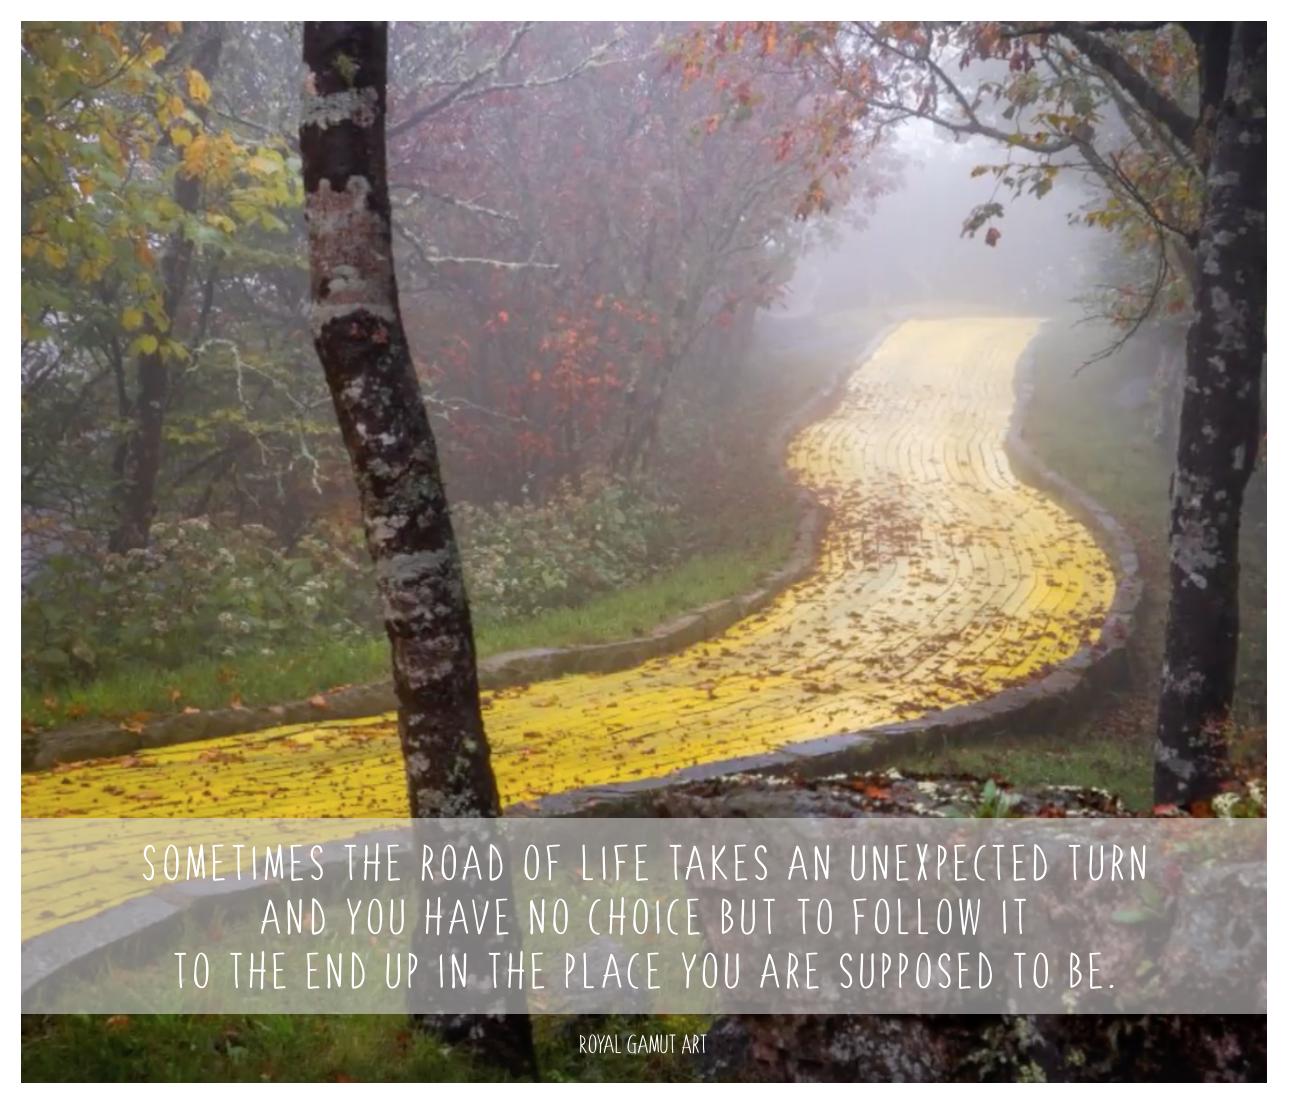 Yellow brick Road of Life Quote